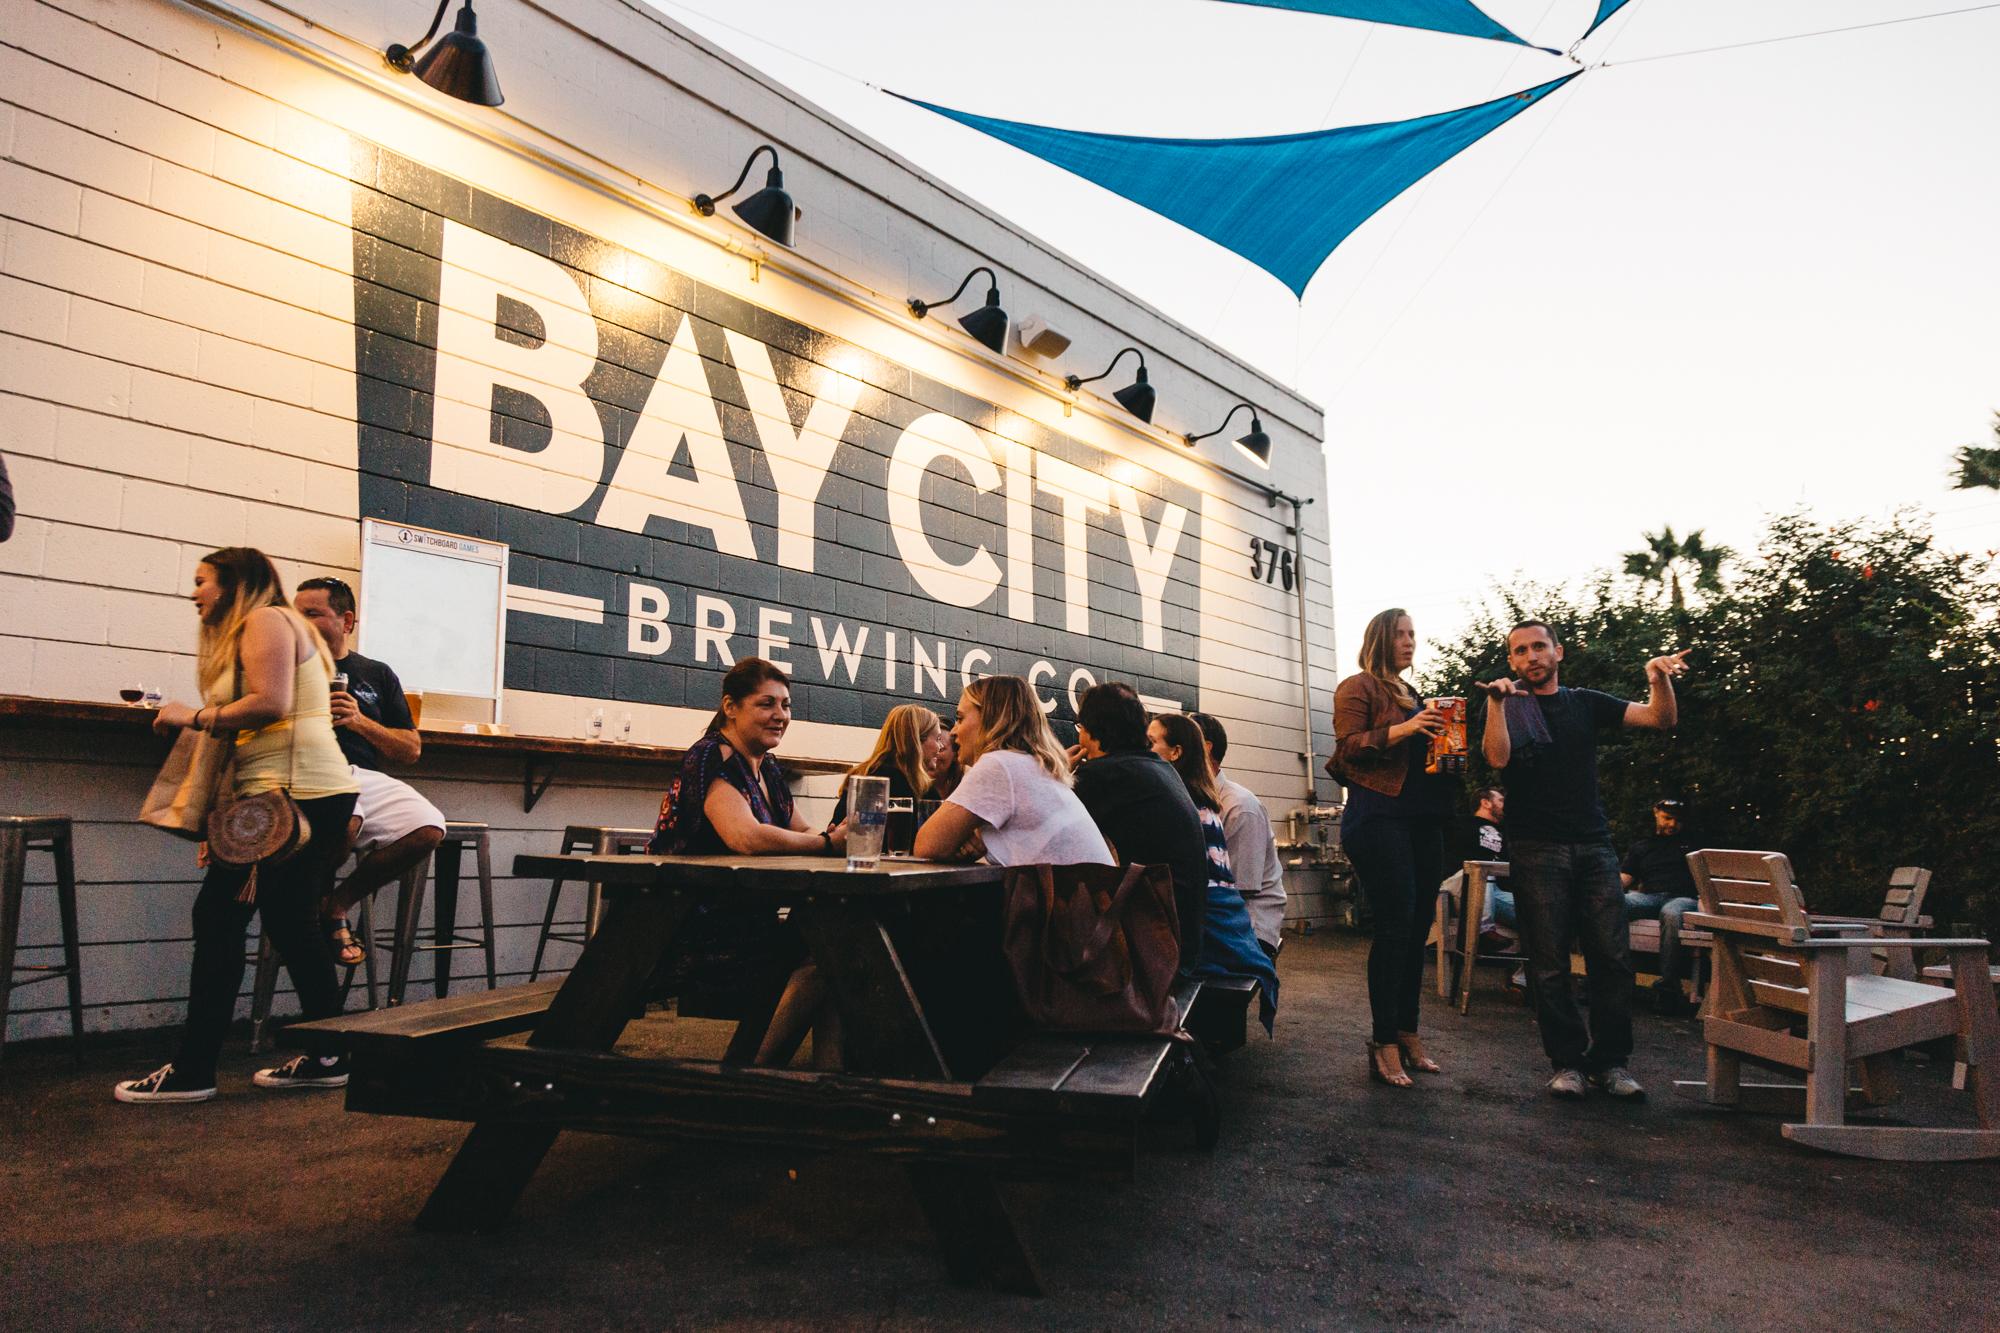 bay city-8798.JPG